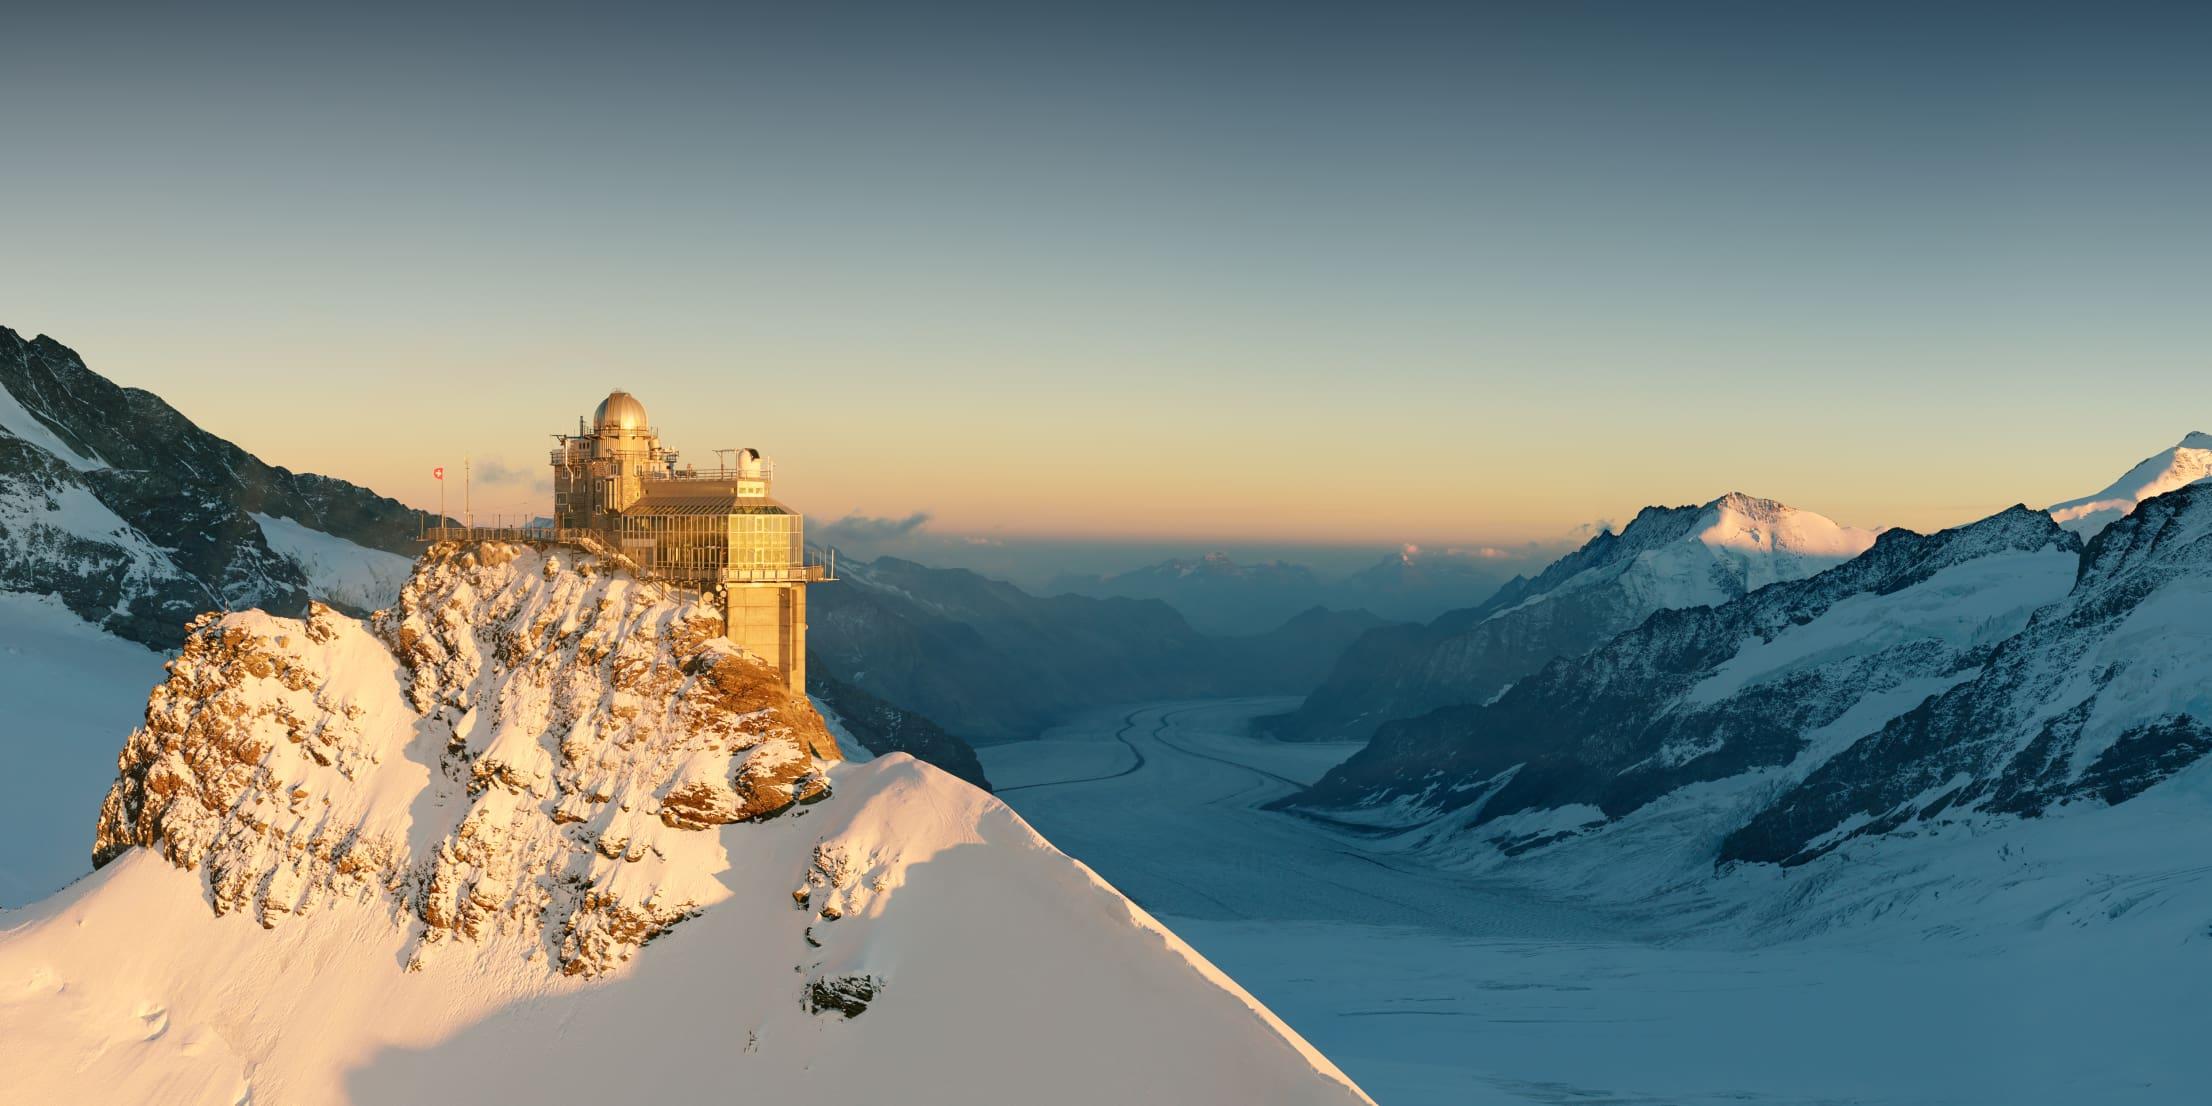 Jungfraujoch Sphinx Gletscher Sonnenuntergang